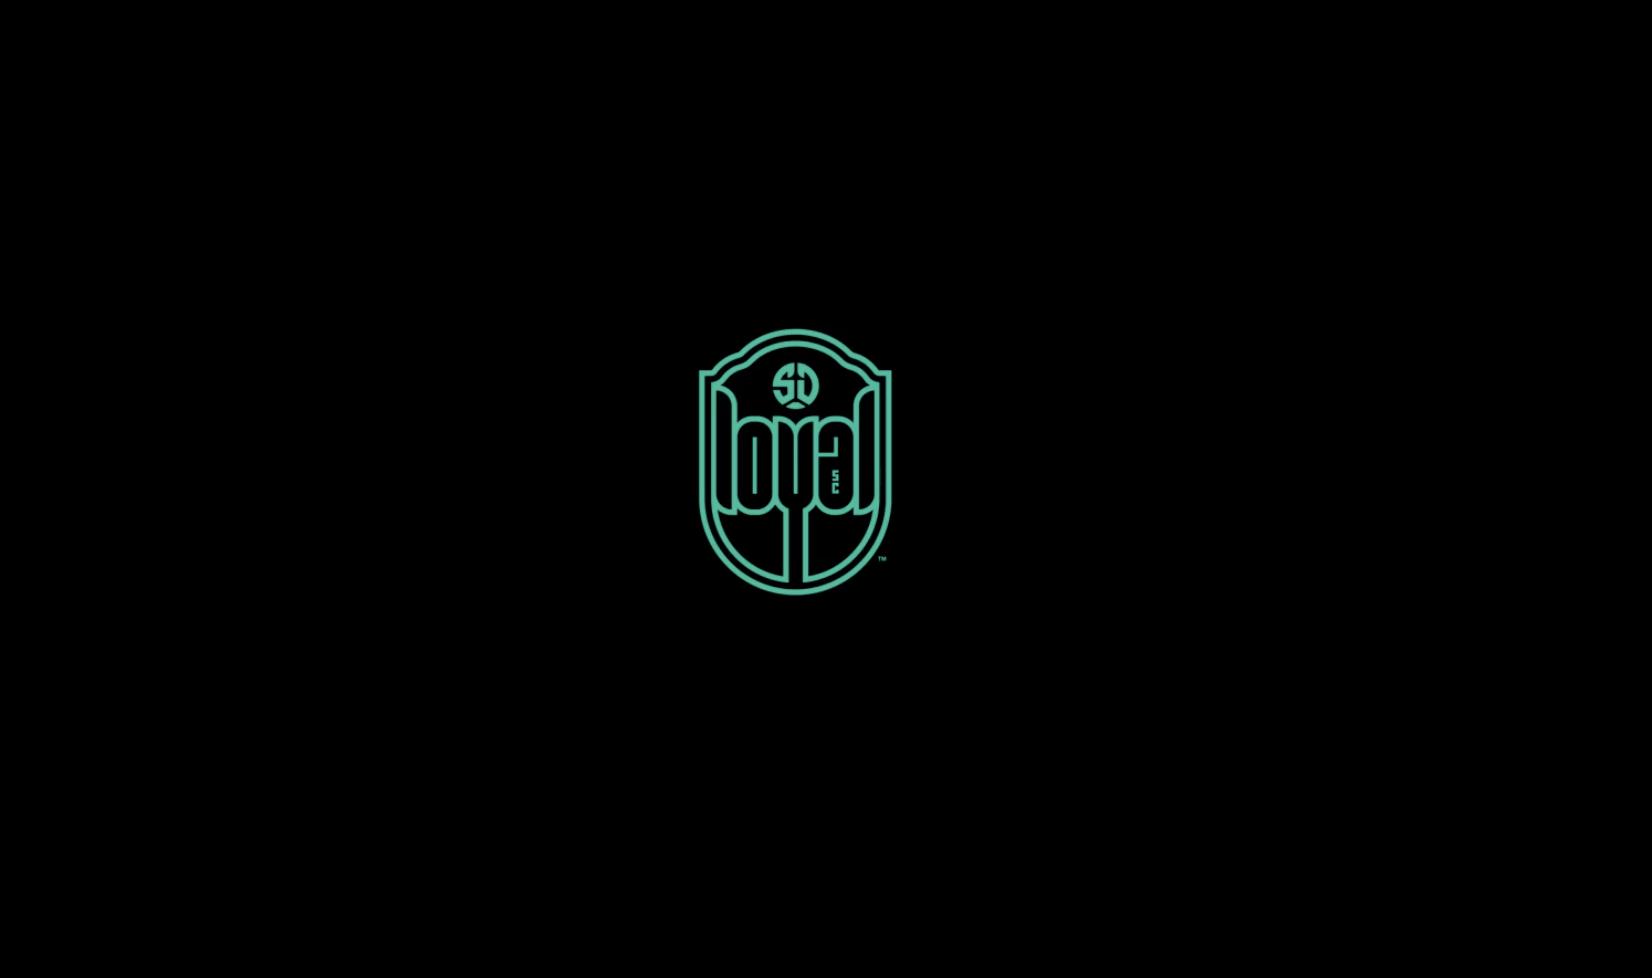 Loyal Dominate Galaxy II to Keep Playoff Hopes Alive